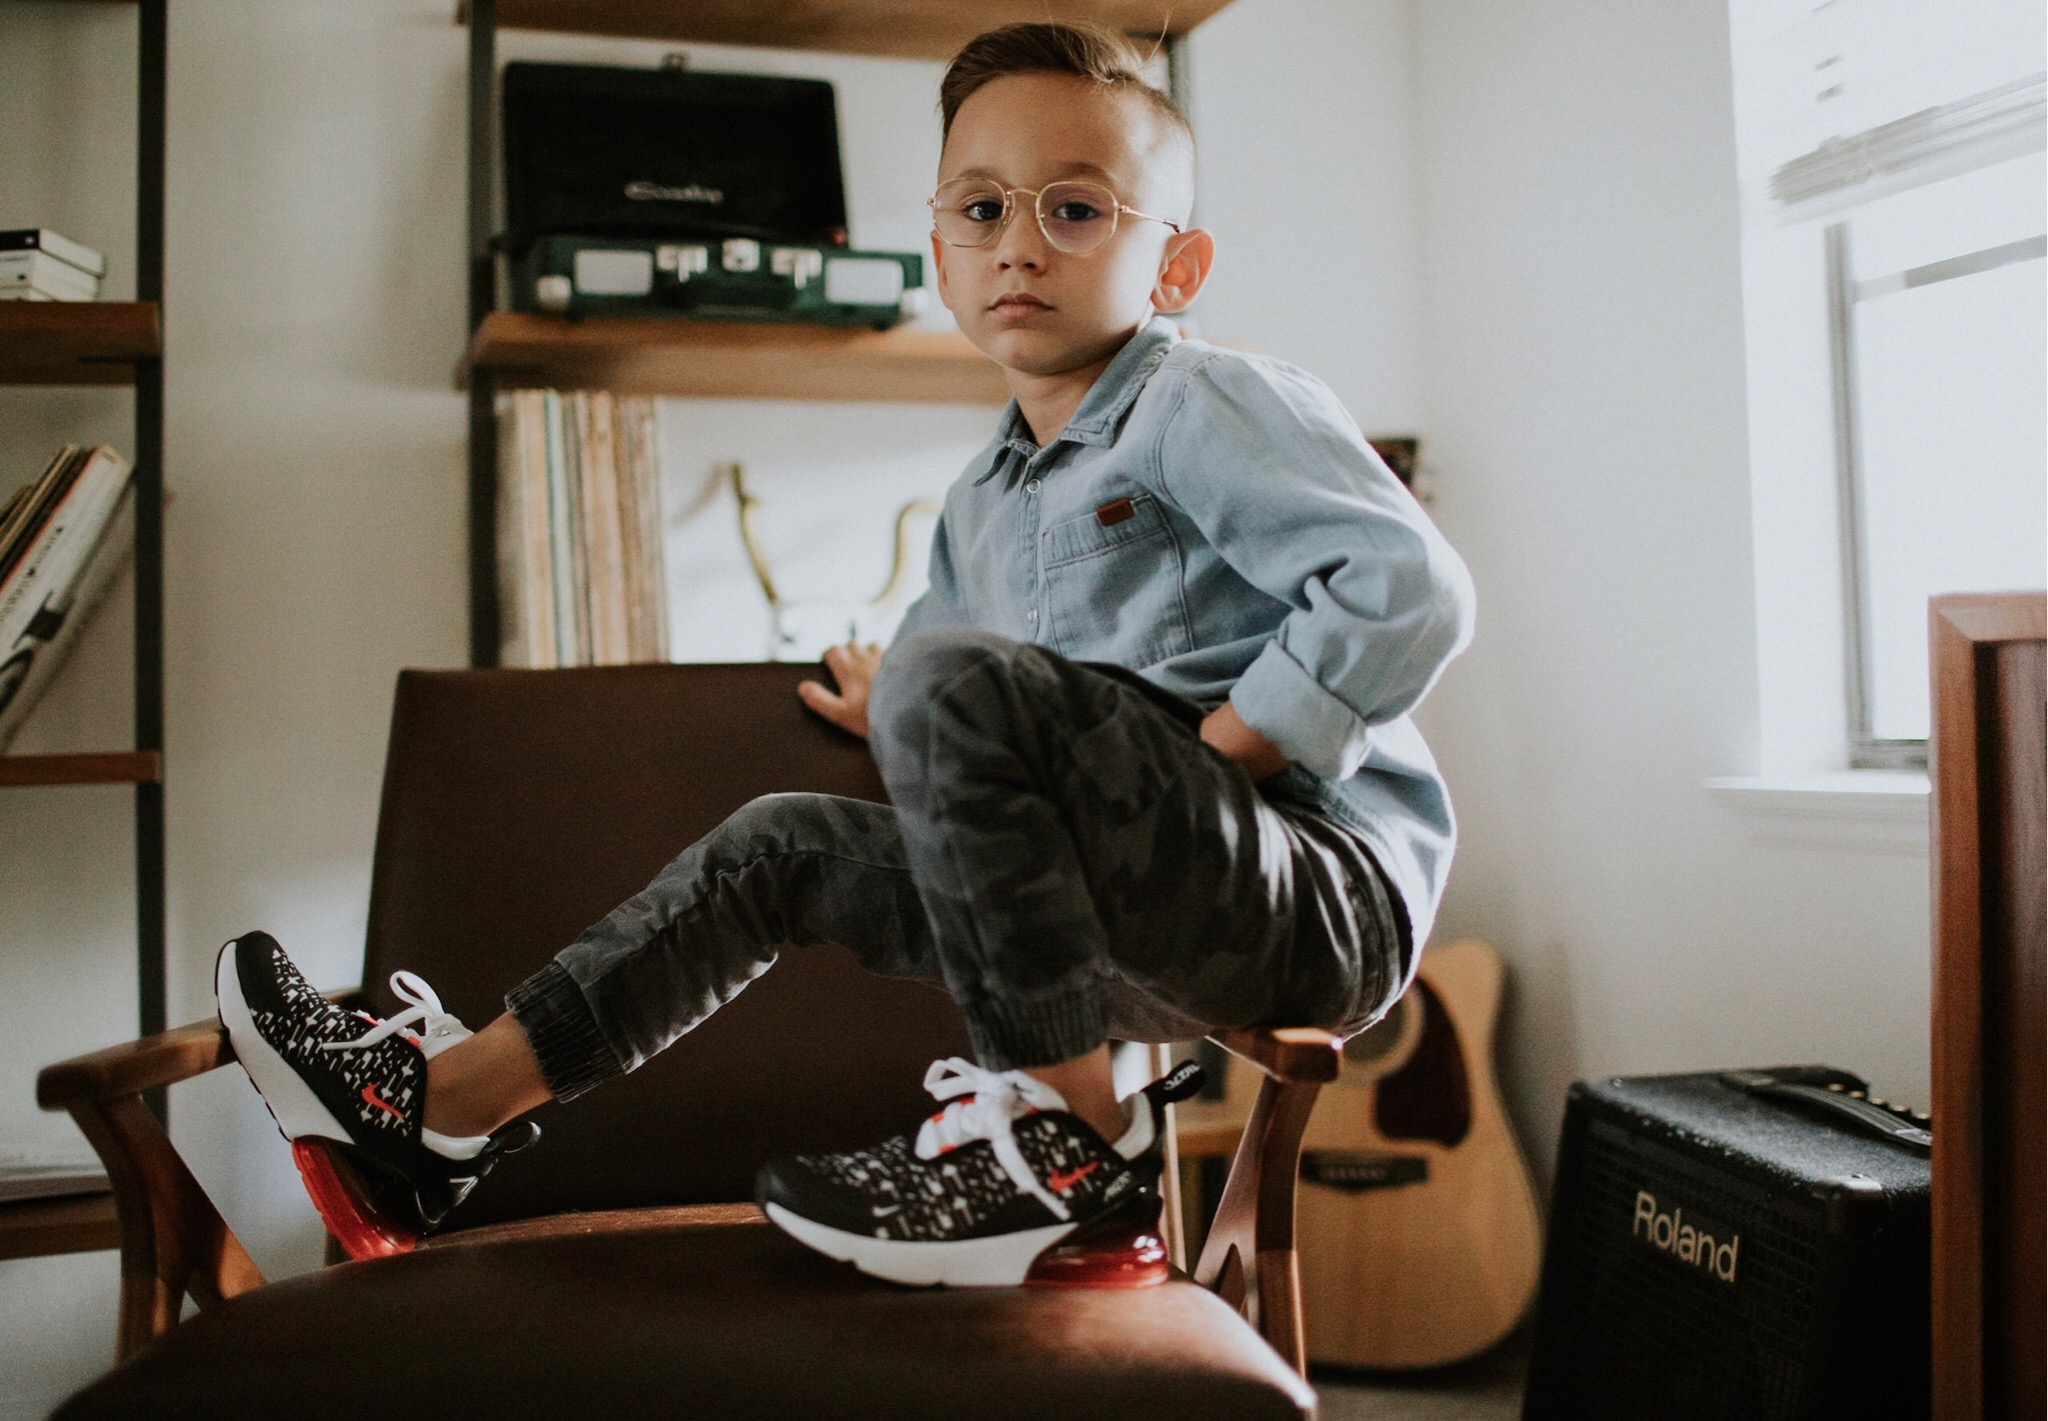 Lucas Boy | Orlando FL | MODEL | Hype kids | Photographed by Vanessa Boy .JPG